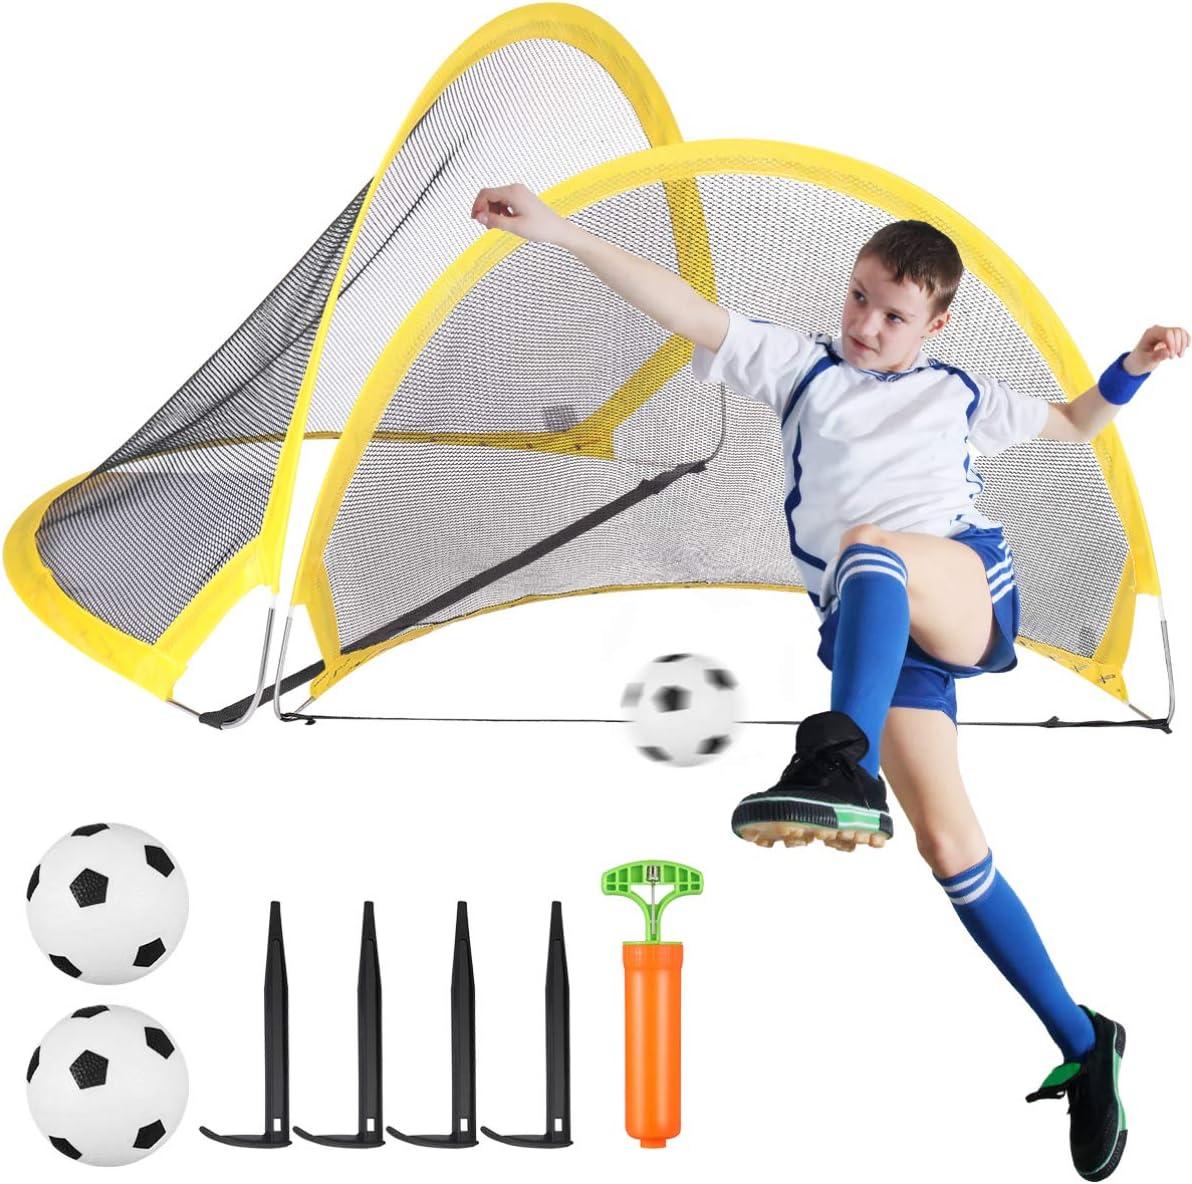 2 pcs Portable Pop-Up Soccer Goal Net For Football Training Indoor Outdoor Kids